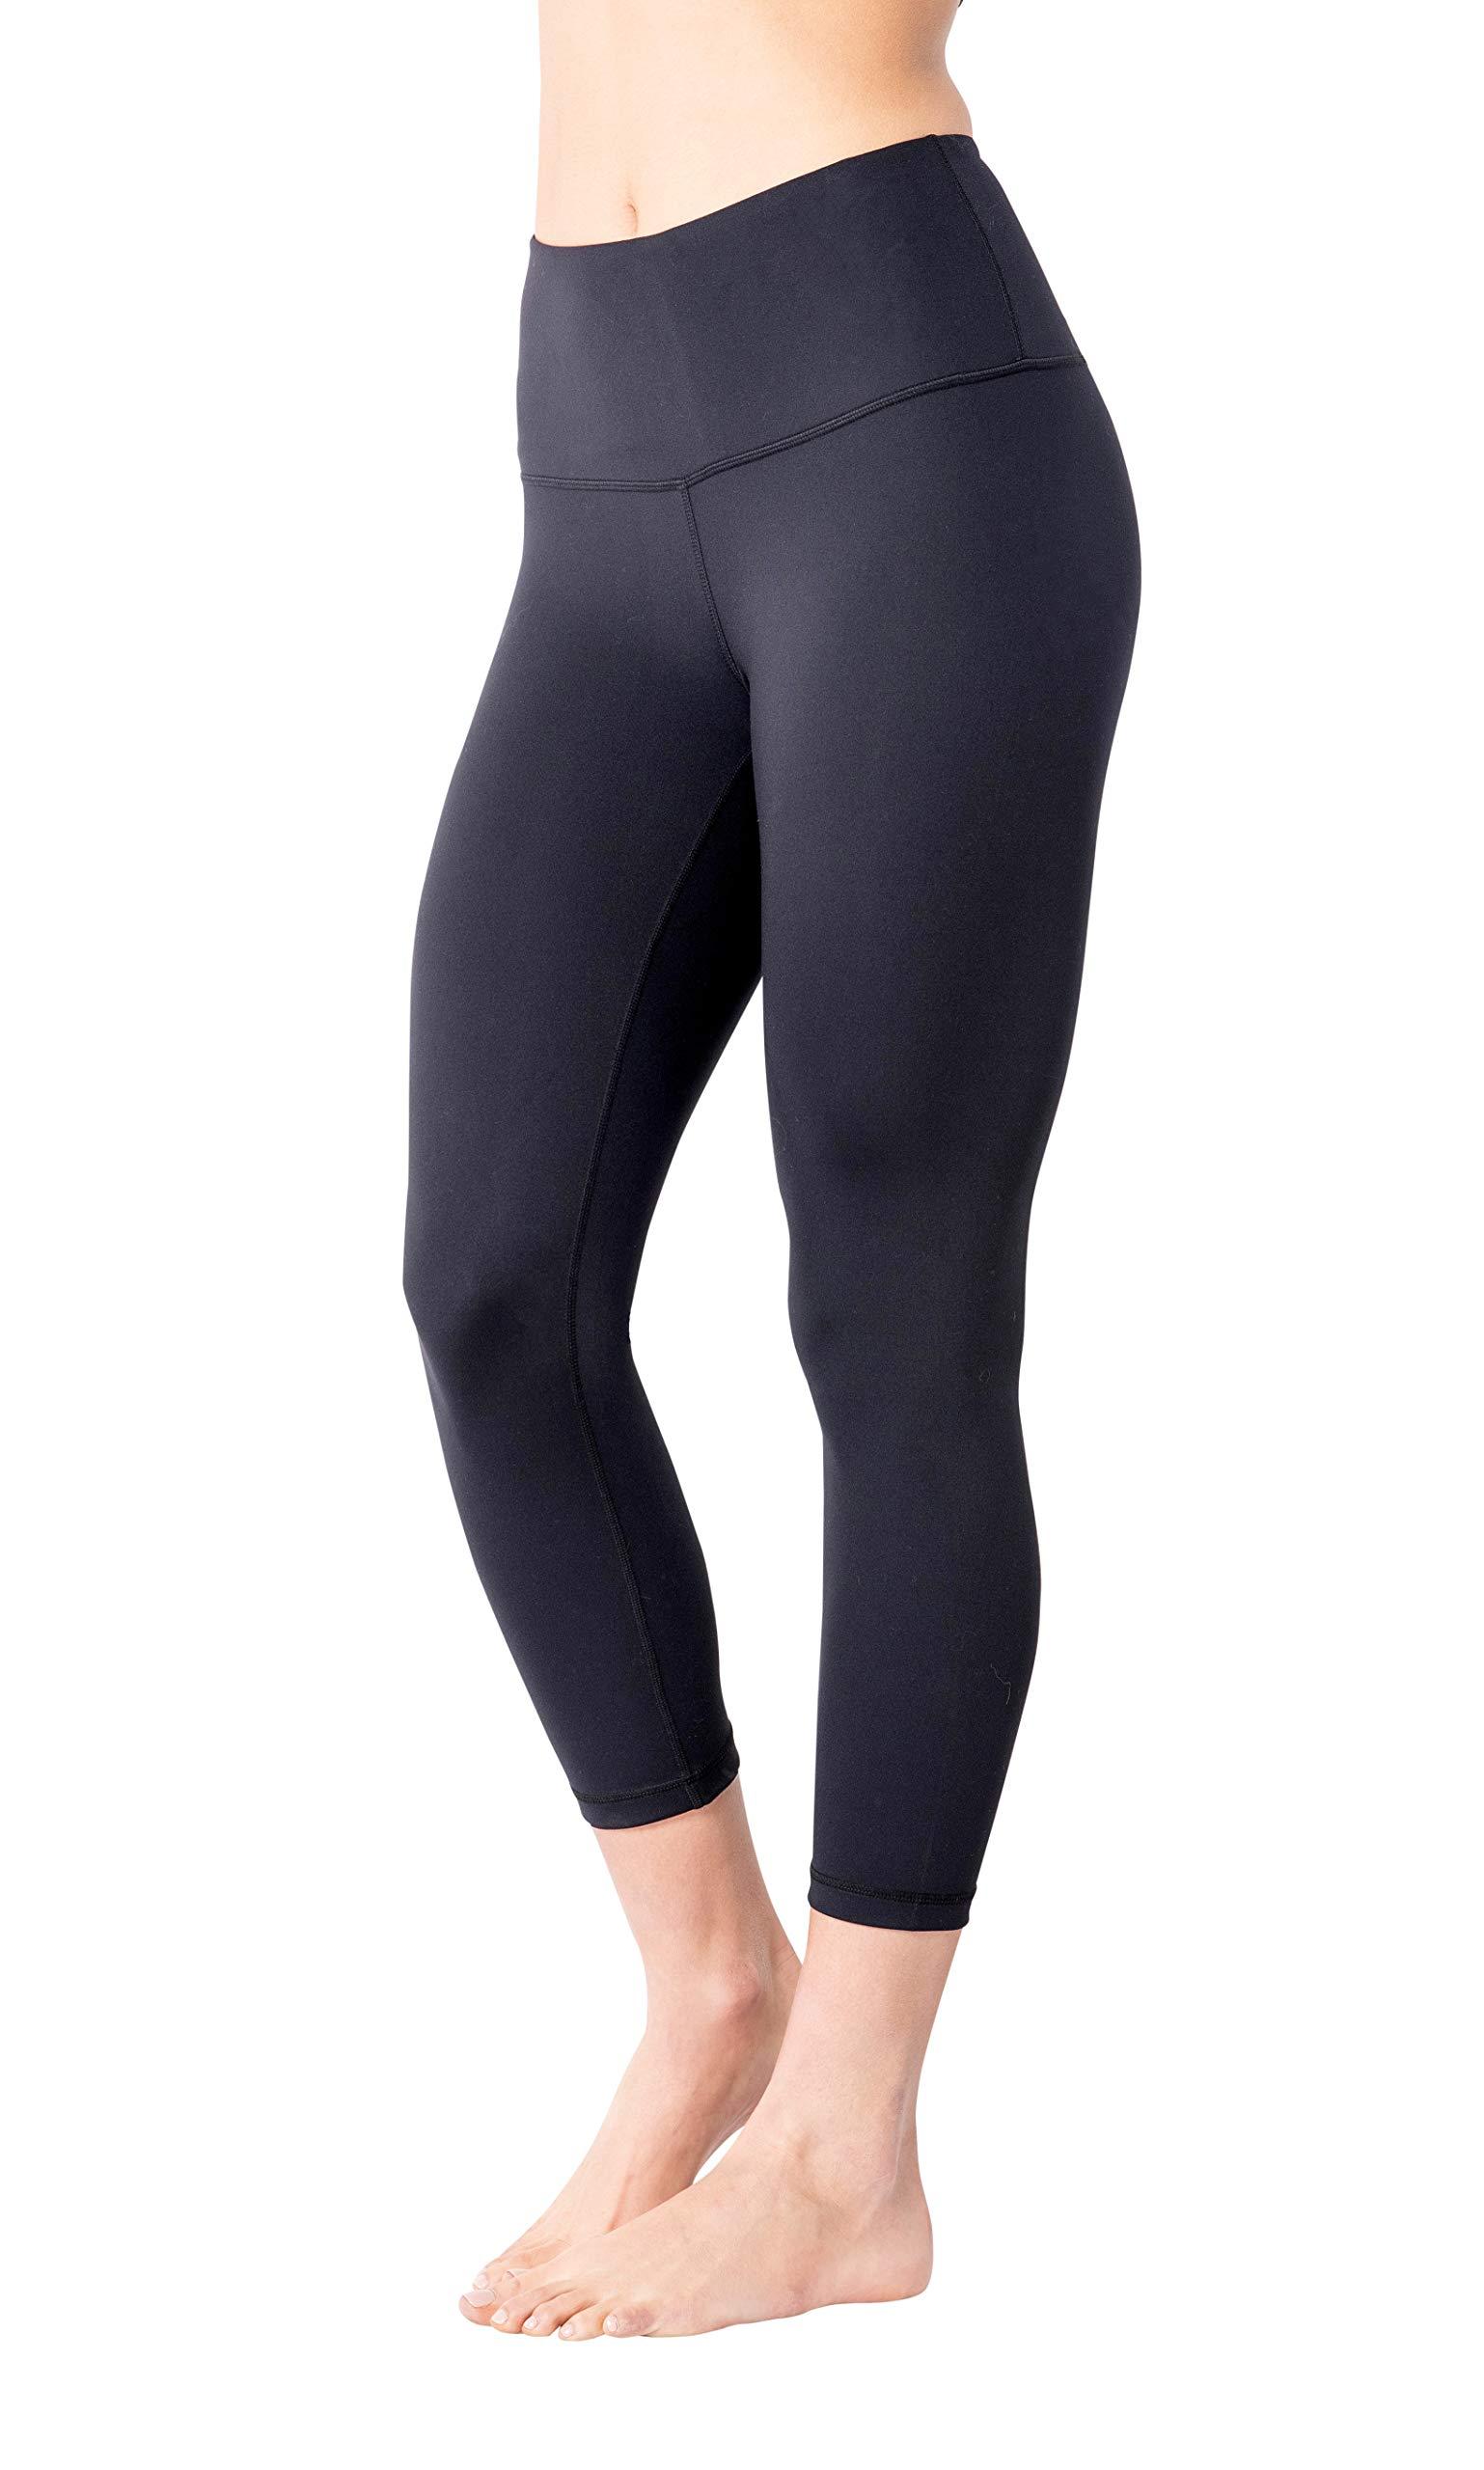 Yogalicious High Waist Ultra Soft Lightweight Capris - High Rise Yoga Pants - Classic Black - XL by Yogalicious